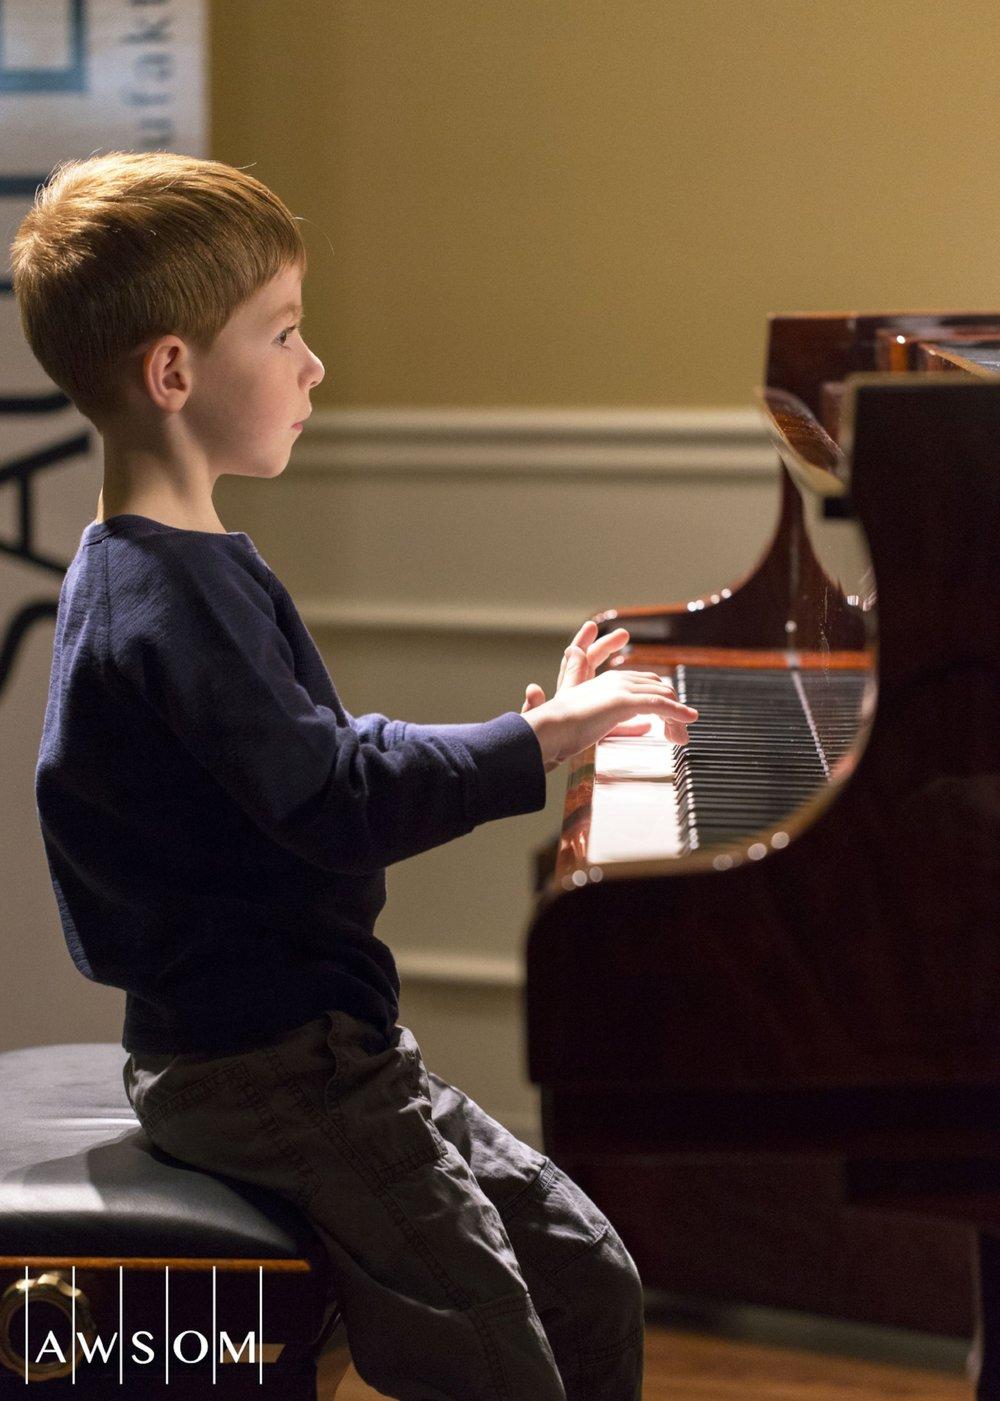 Awsom_Piano_recital.jpg